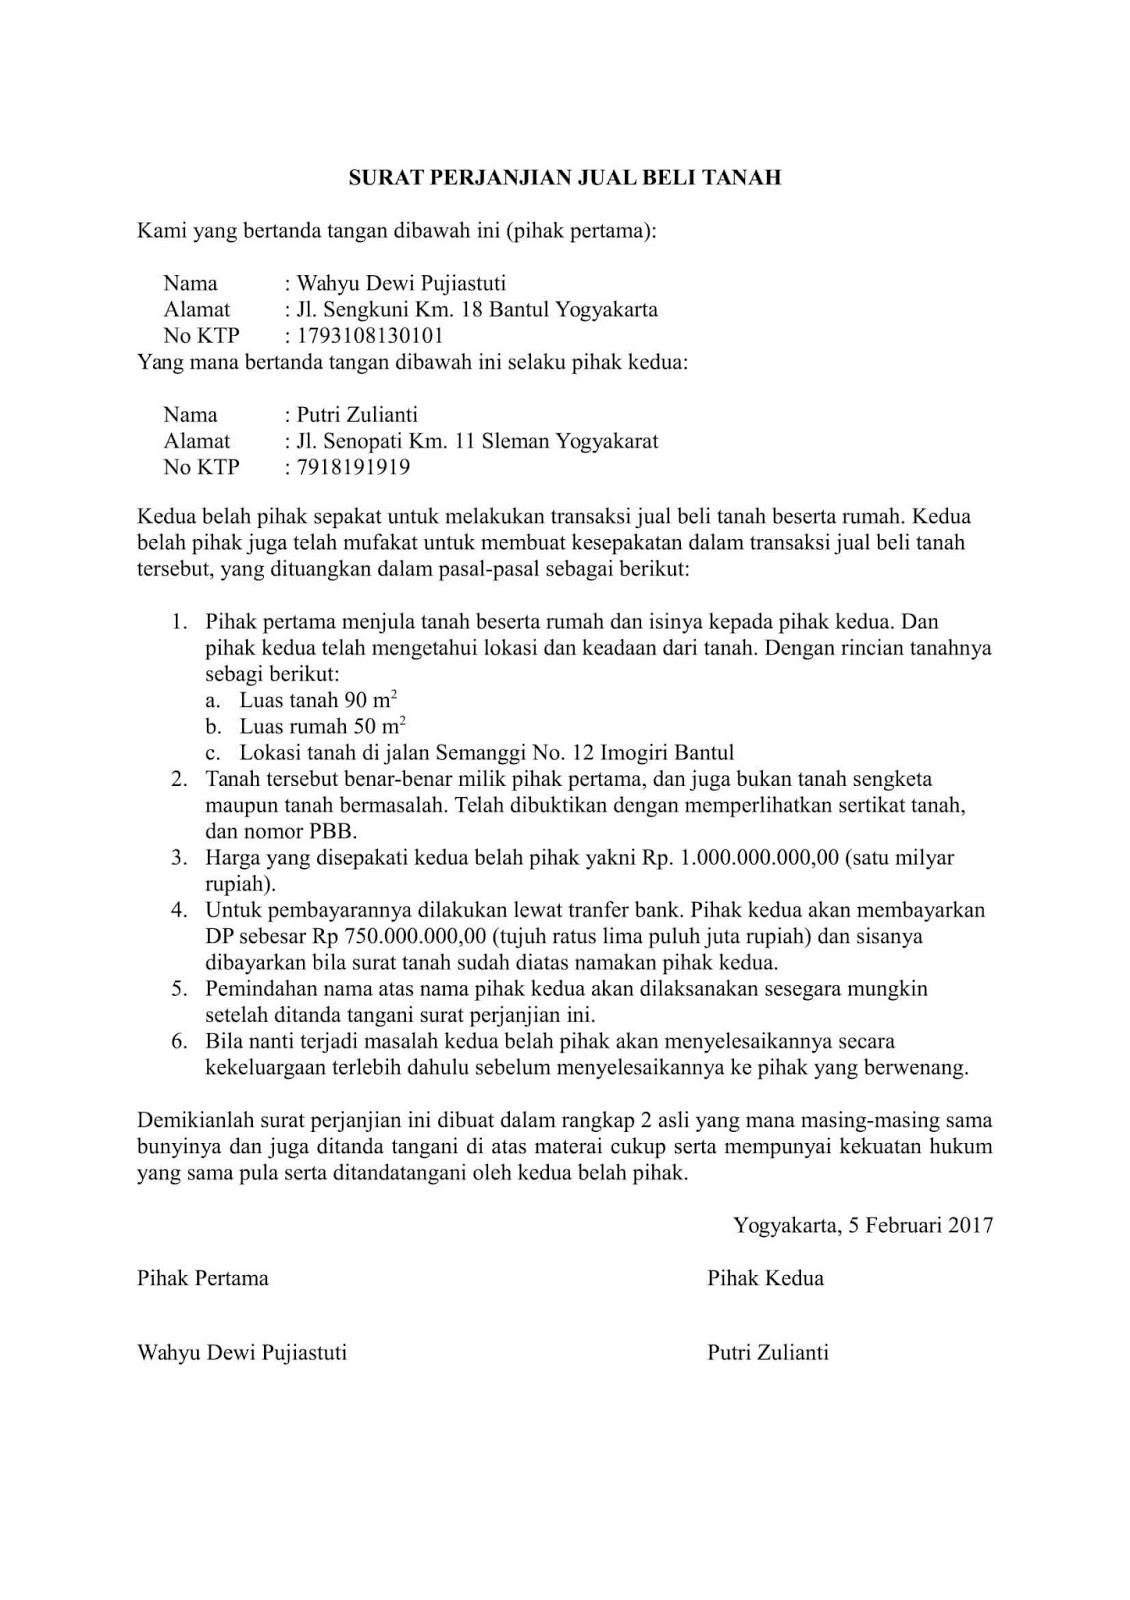 Contoh Surat Perjanjian Jual Beli Tanah Terbaru Terlengkap